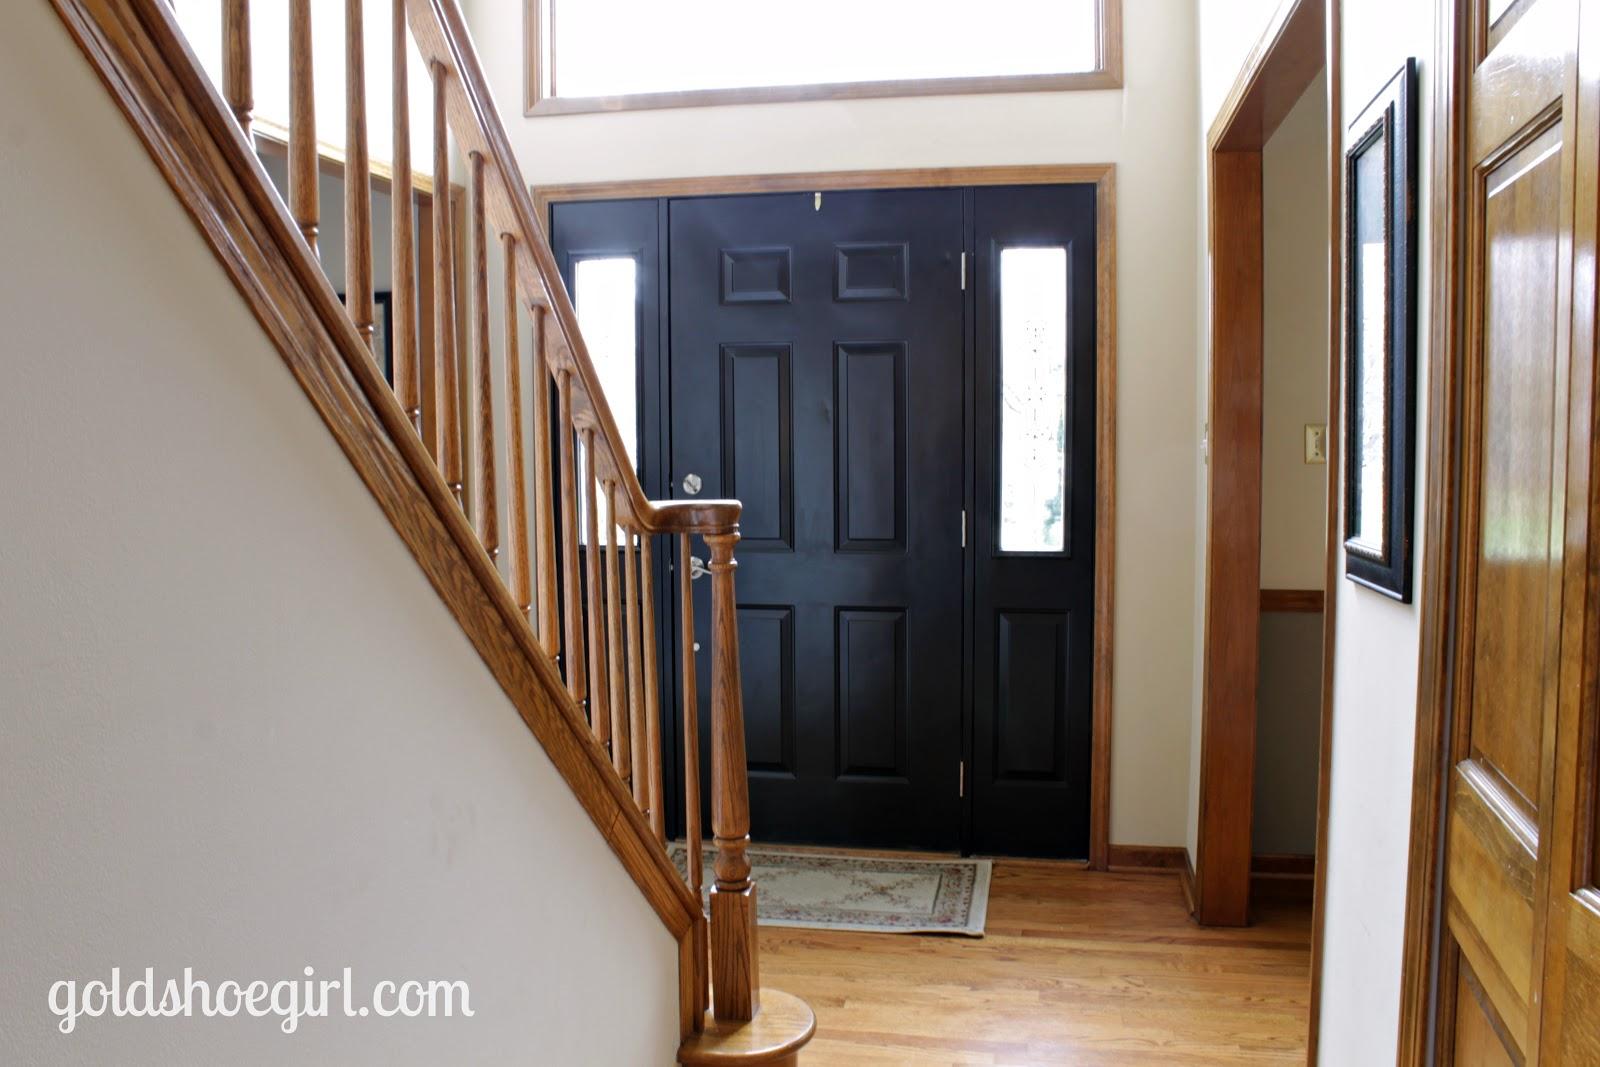 Gold Shoe Girl Front Door Before Amp After